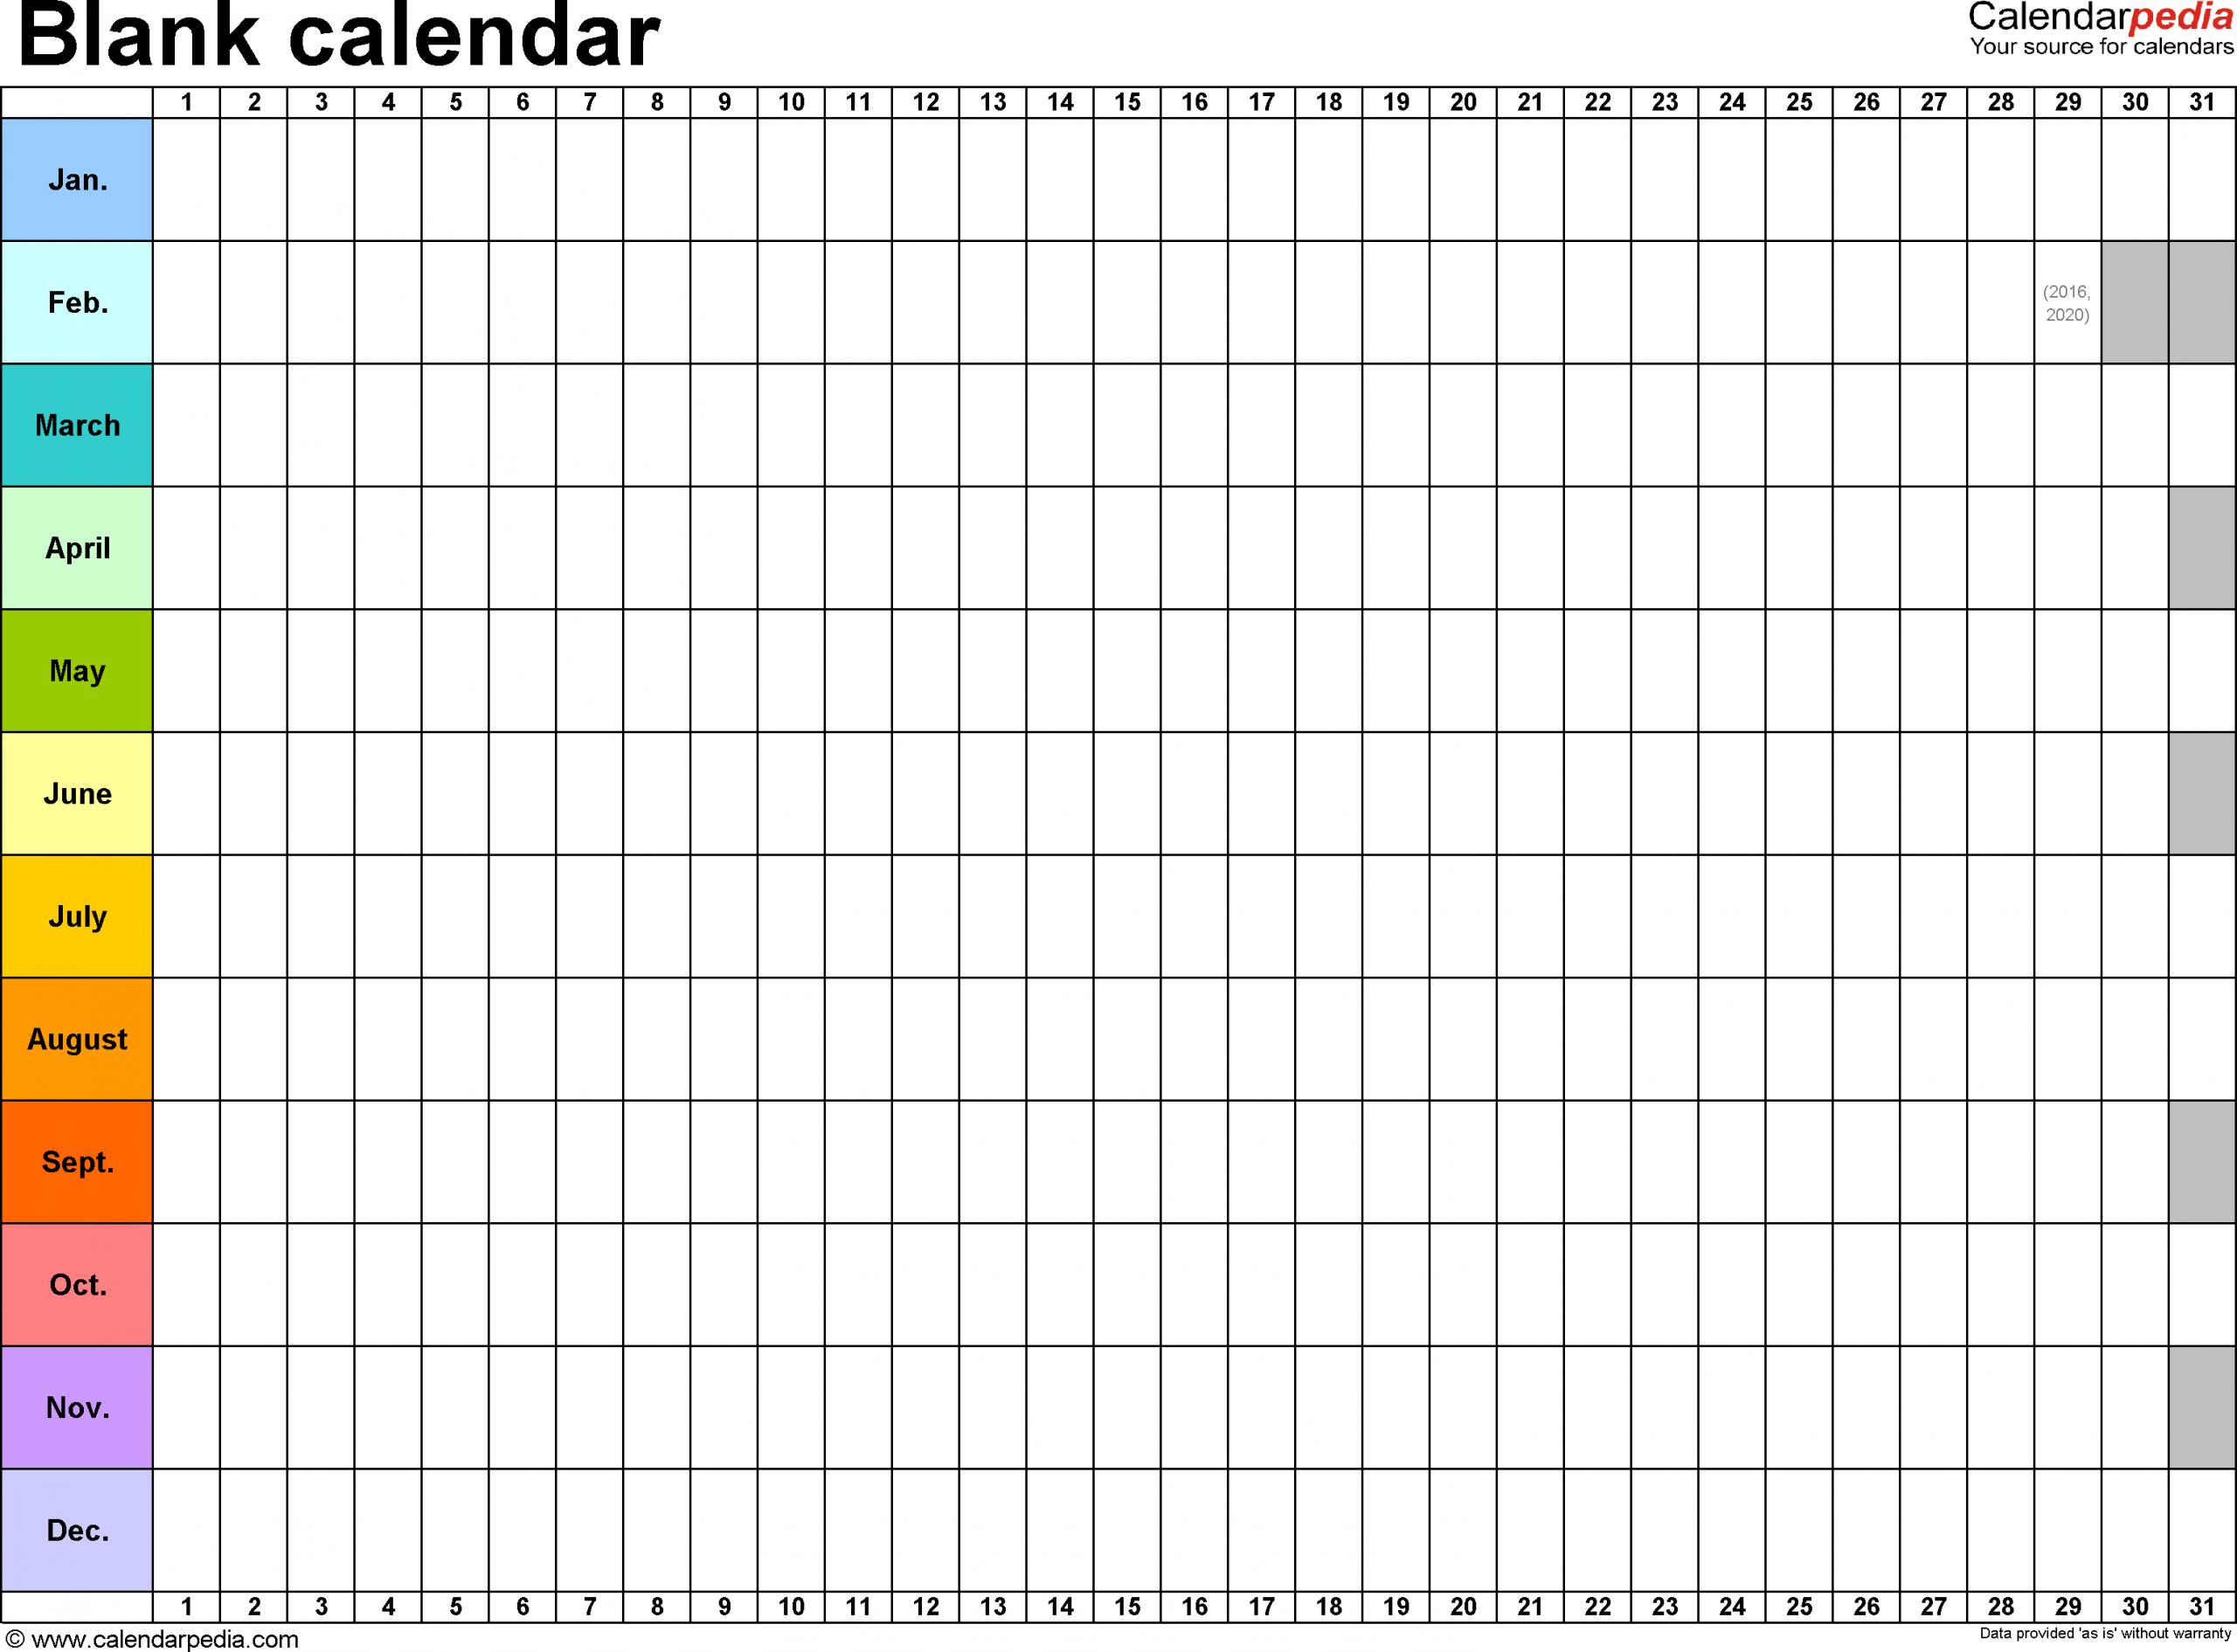 Blank Calendar Print Out | Blank Calendar Template Free 4 Year Calendar Printable